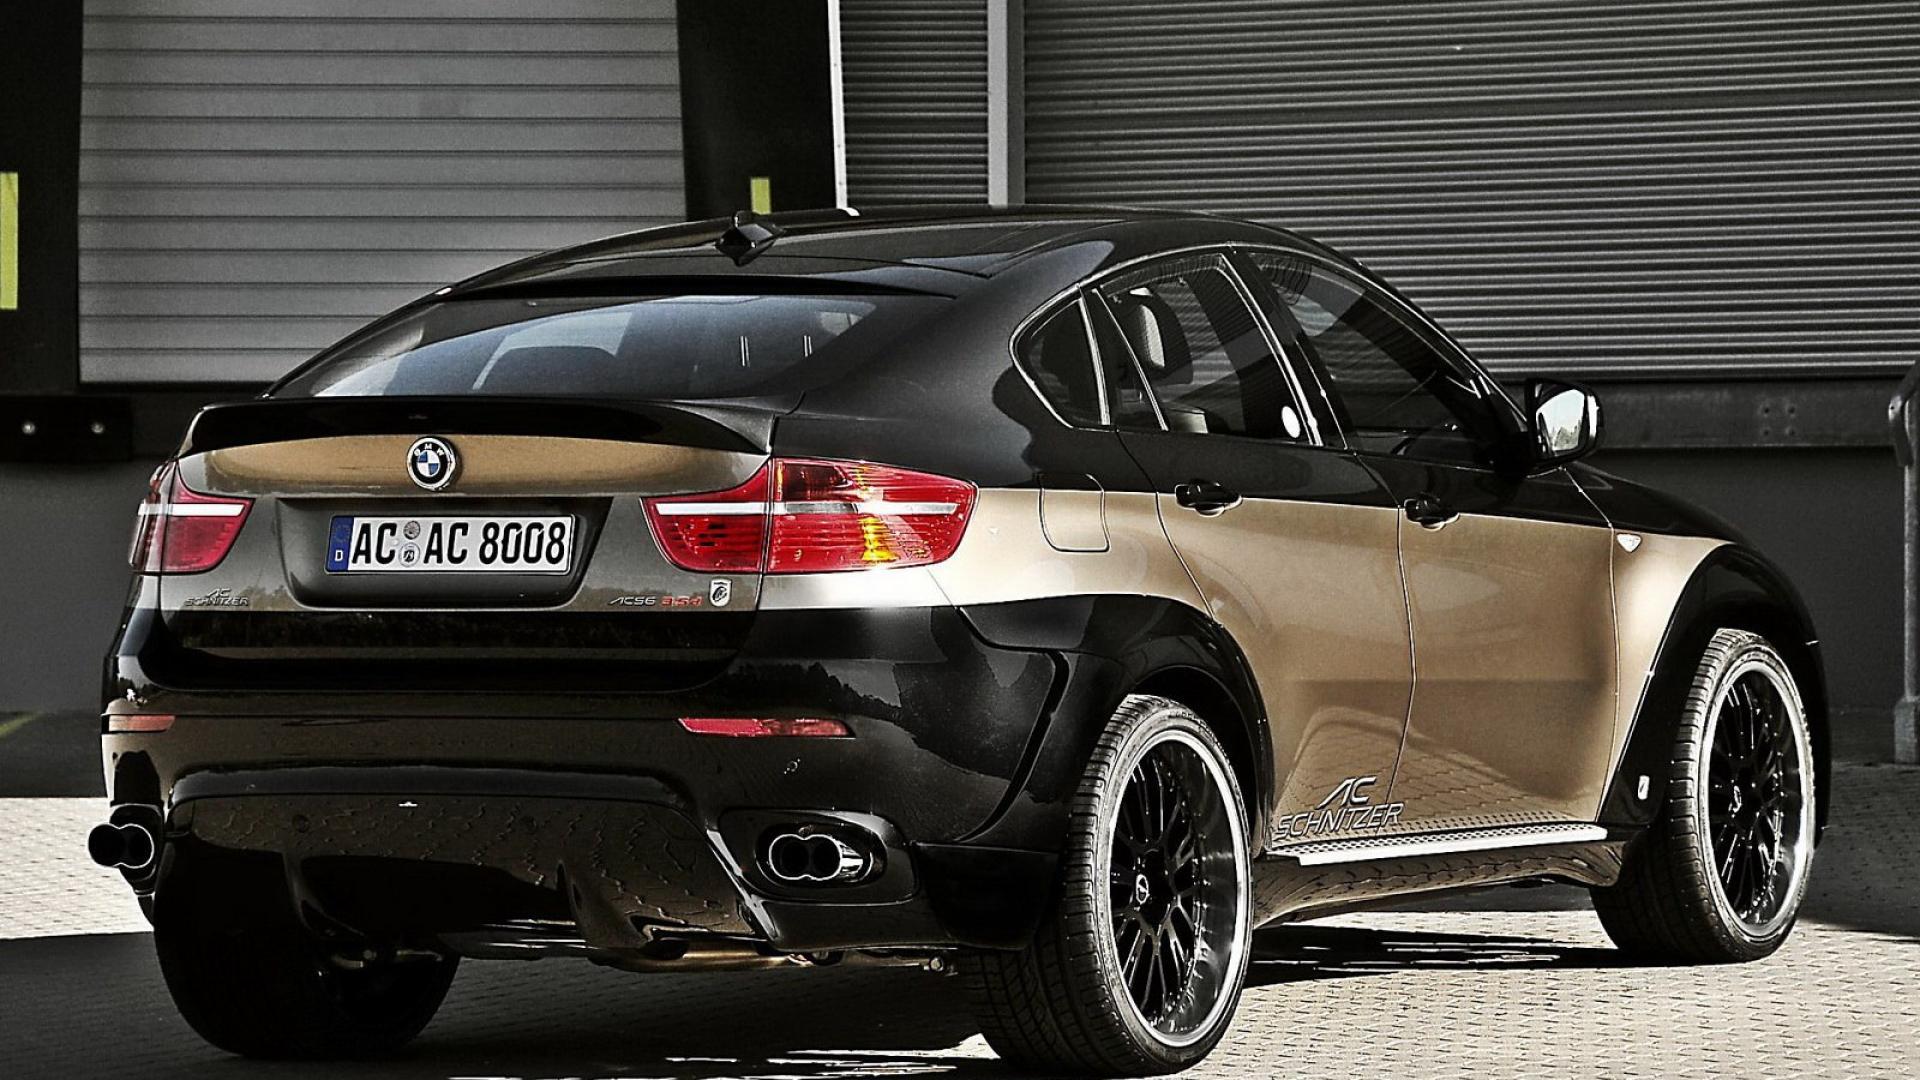 bmw x6m facelift bmw x6m facelift. x6 1920x1200 09. hamann bmw x6